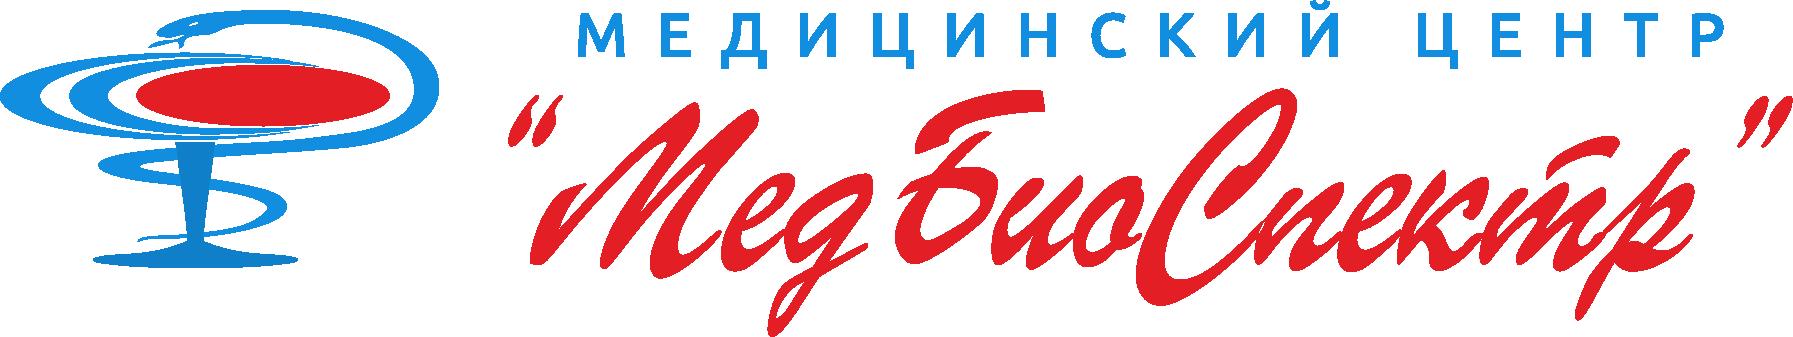 "Медицинский центр ""МЕДБИОСПЕКТР"""